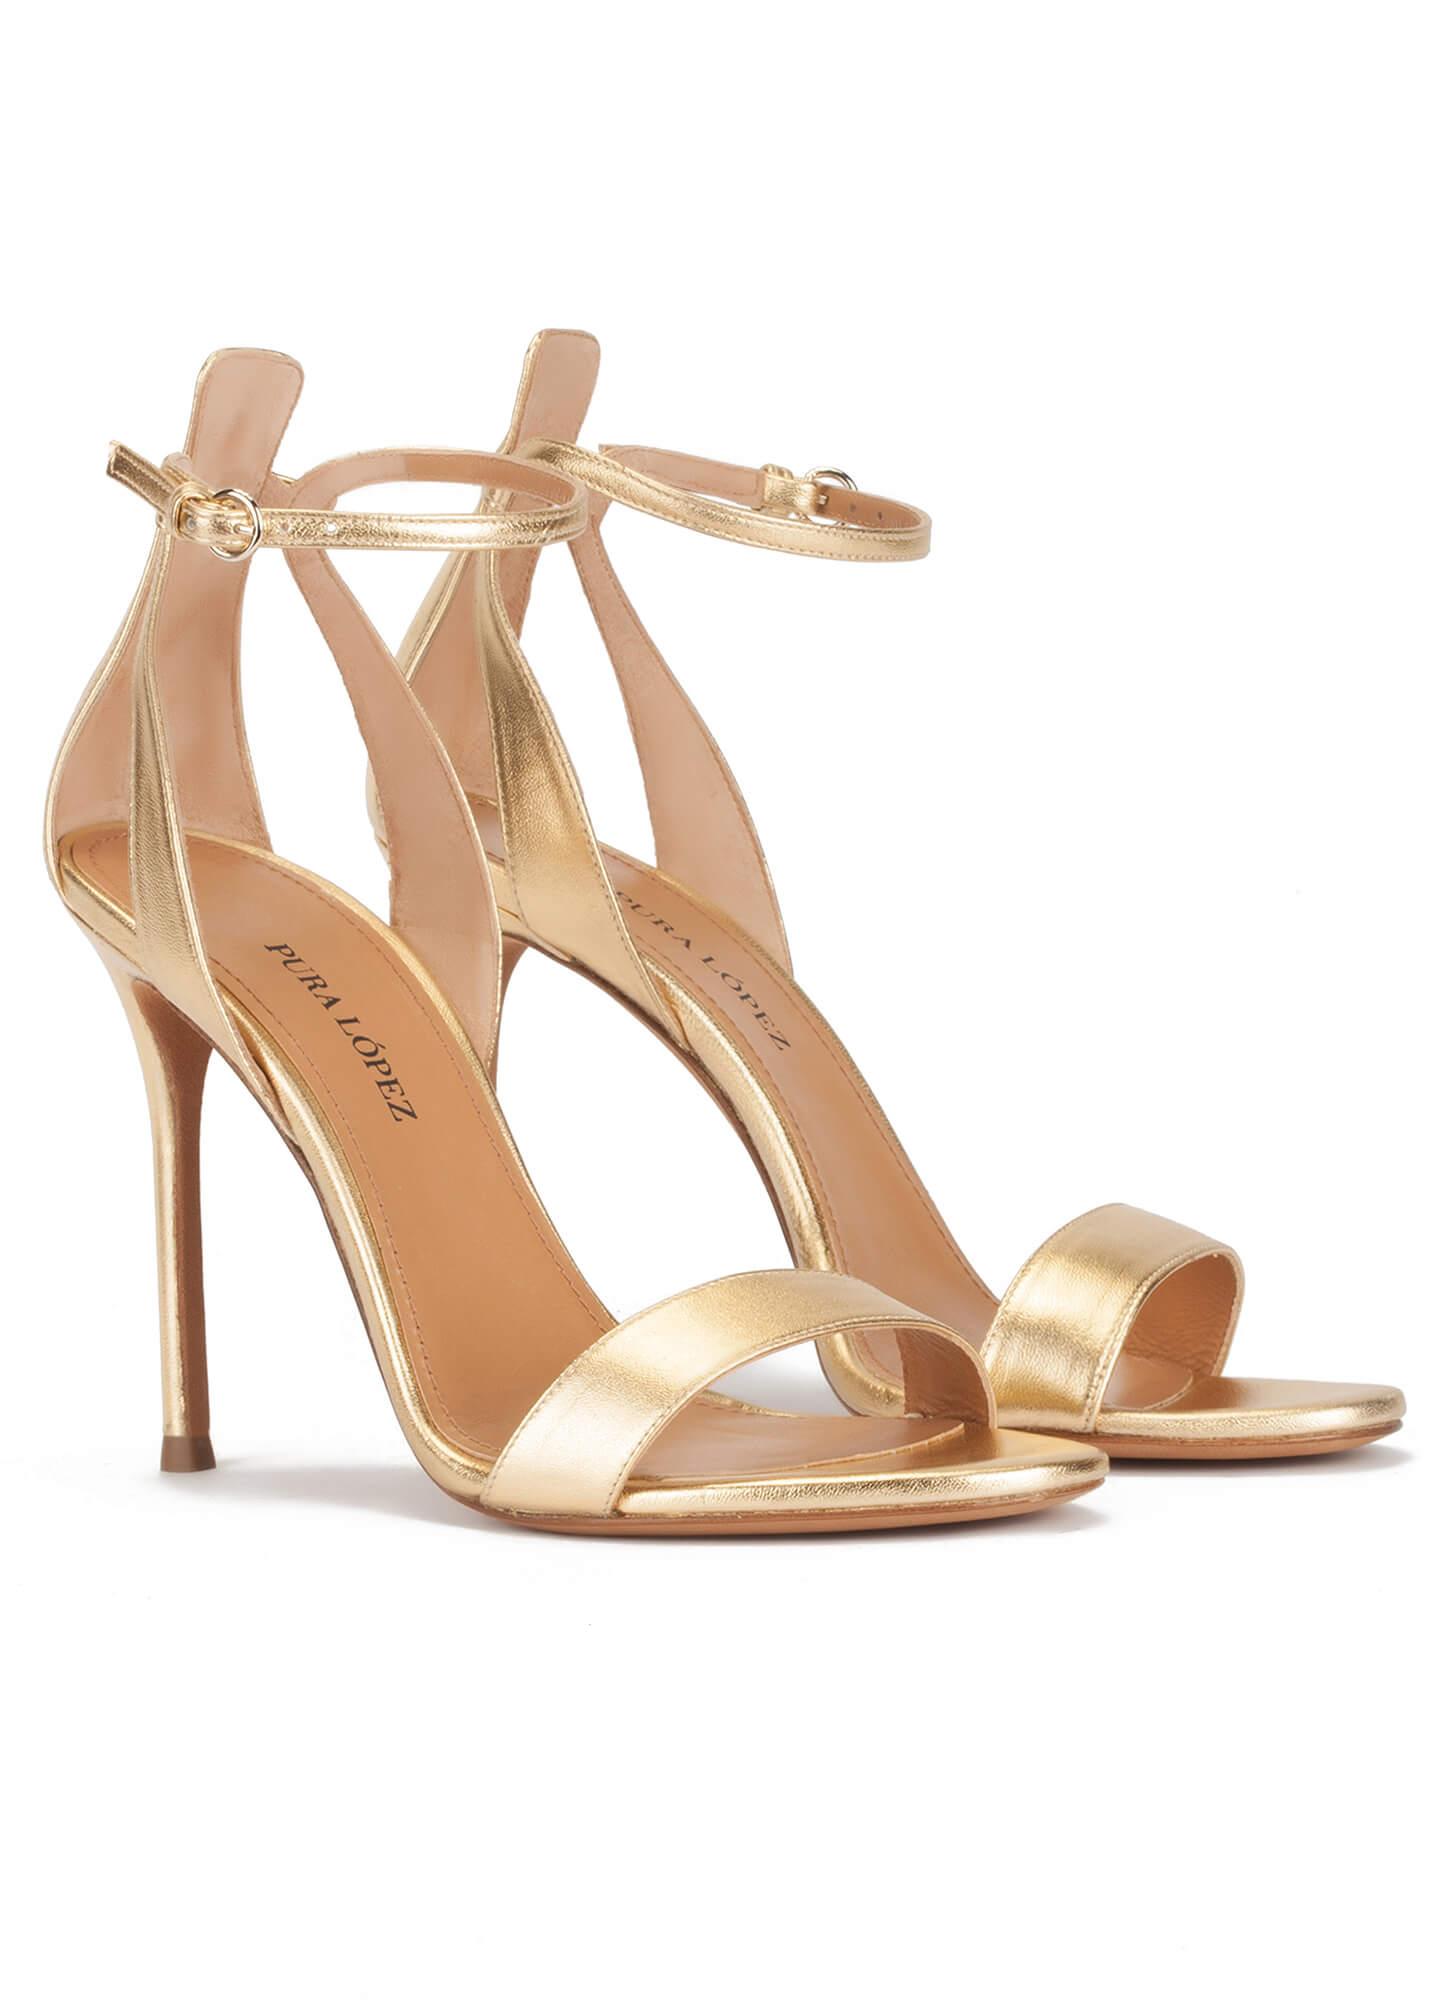 636c051b3f Ankle-strap high heeled sandals in gold metallic leather. Martina Pura López.  prev. next